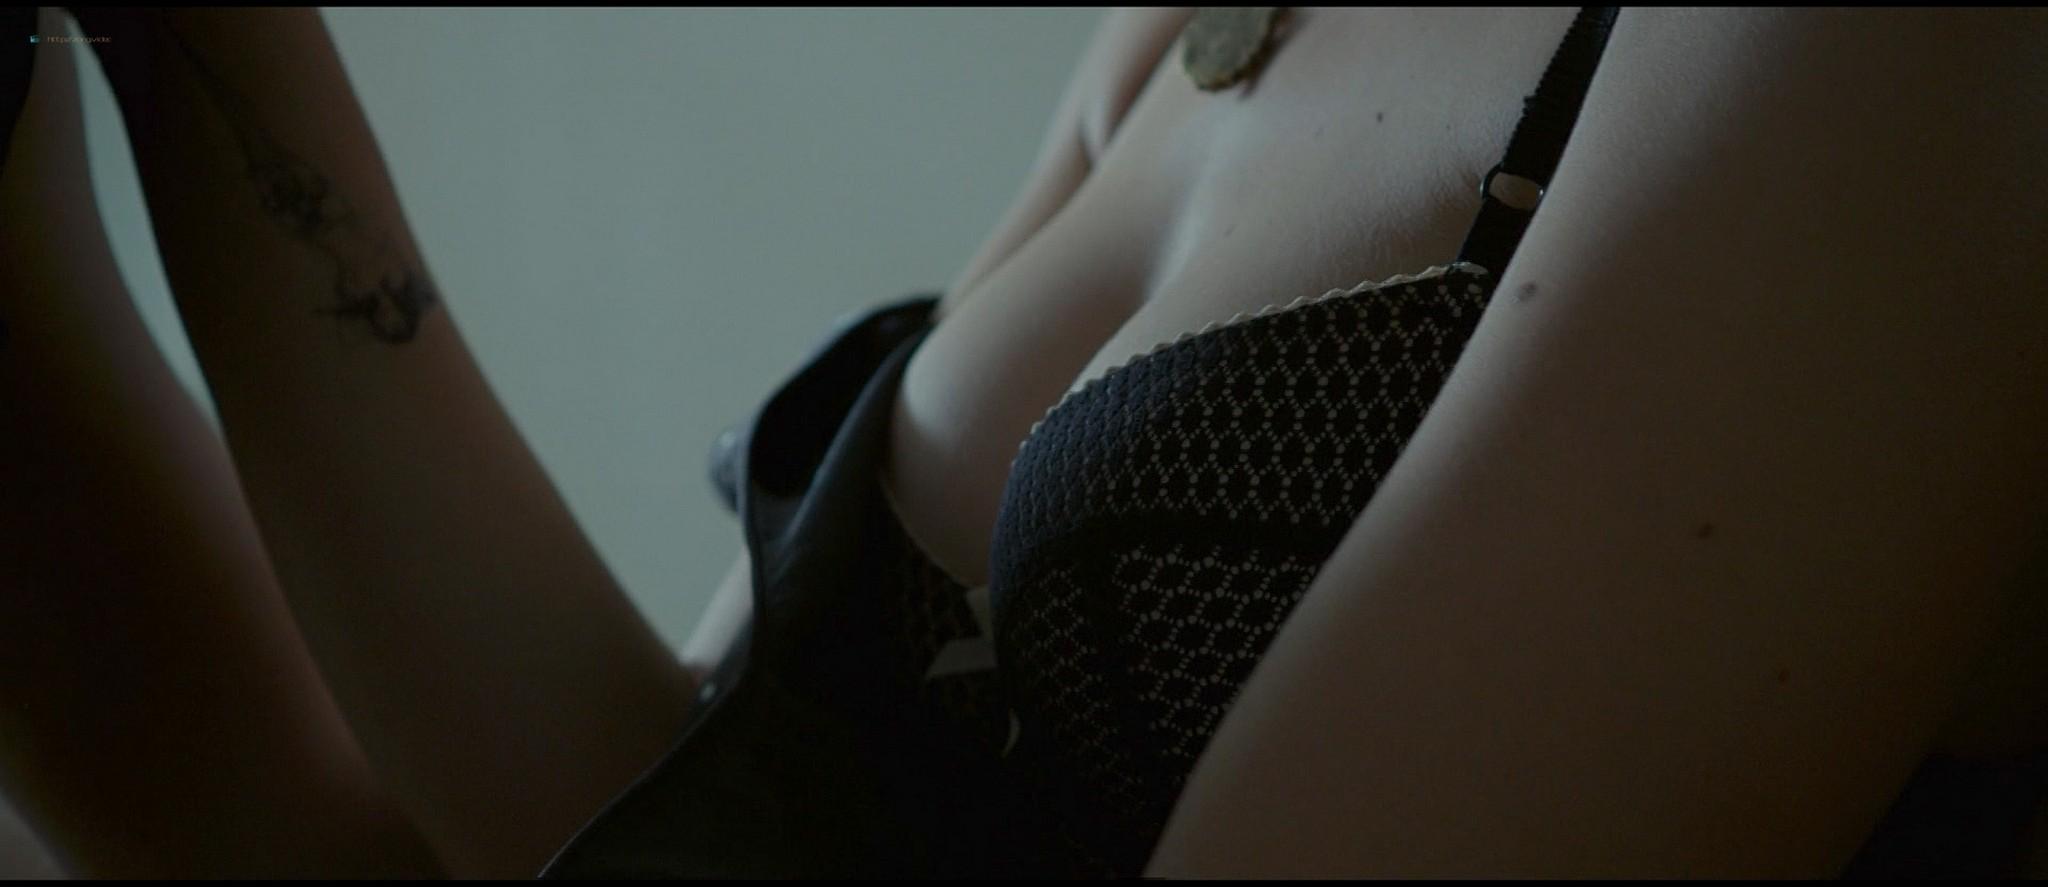 Emmanuelle Béart nude brief topless - My Mistress (AU-2014) HD 1080p BluRay (7)